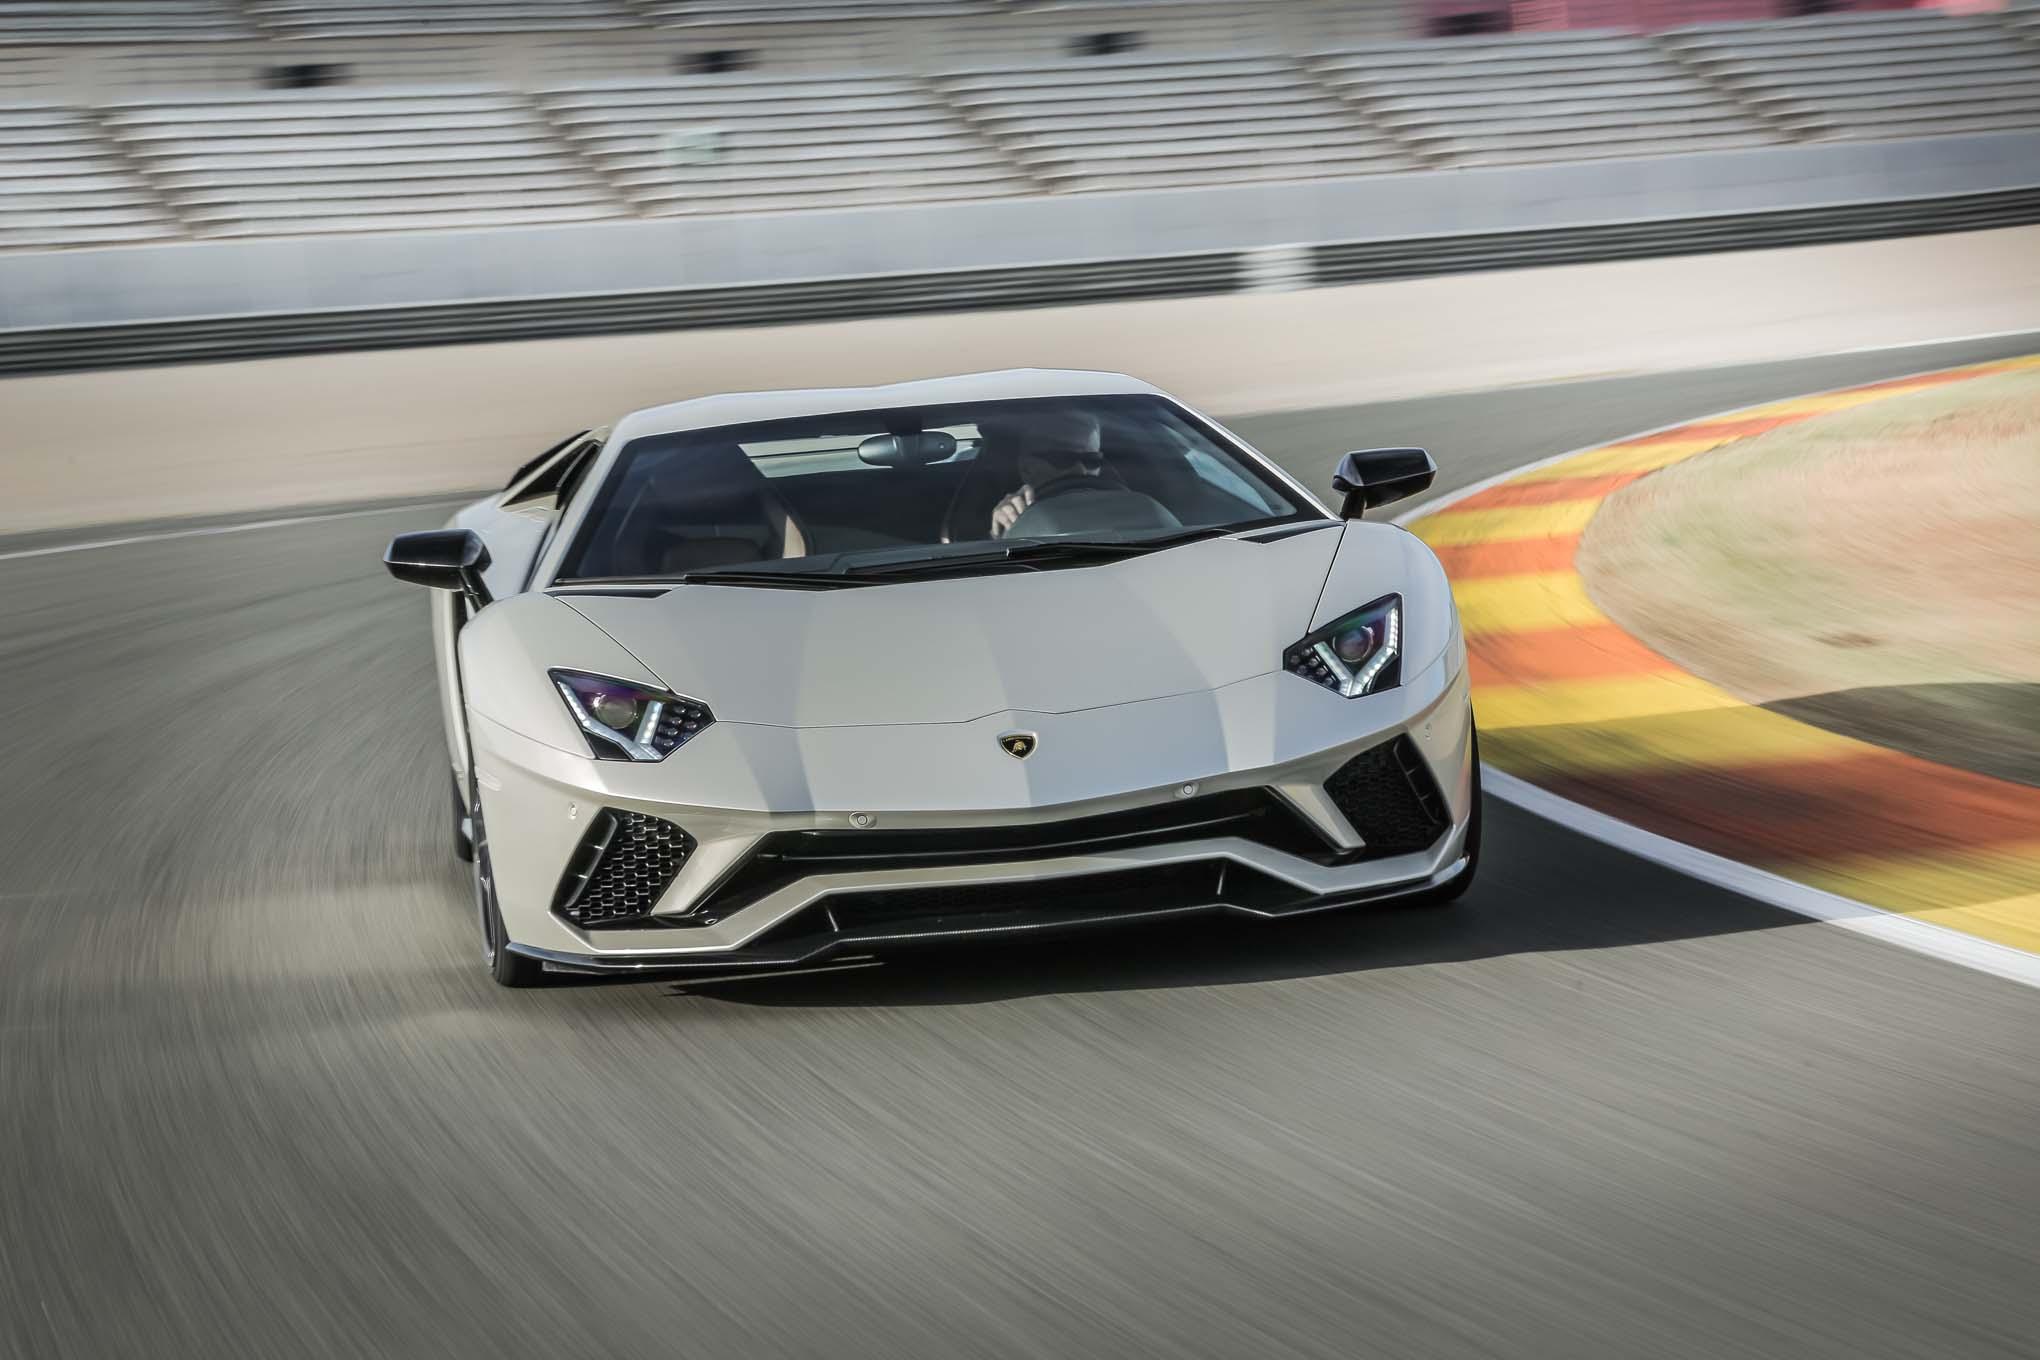 2018 Lamborghini Aventador S Front End In Motion 08 Motor Trend En